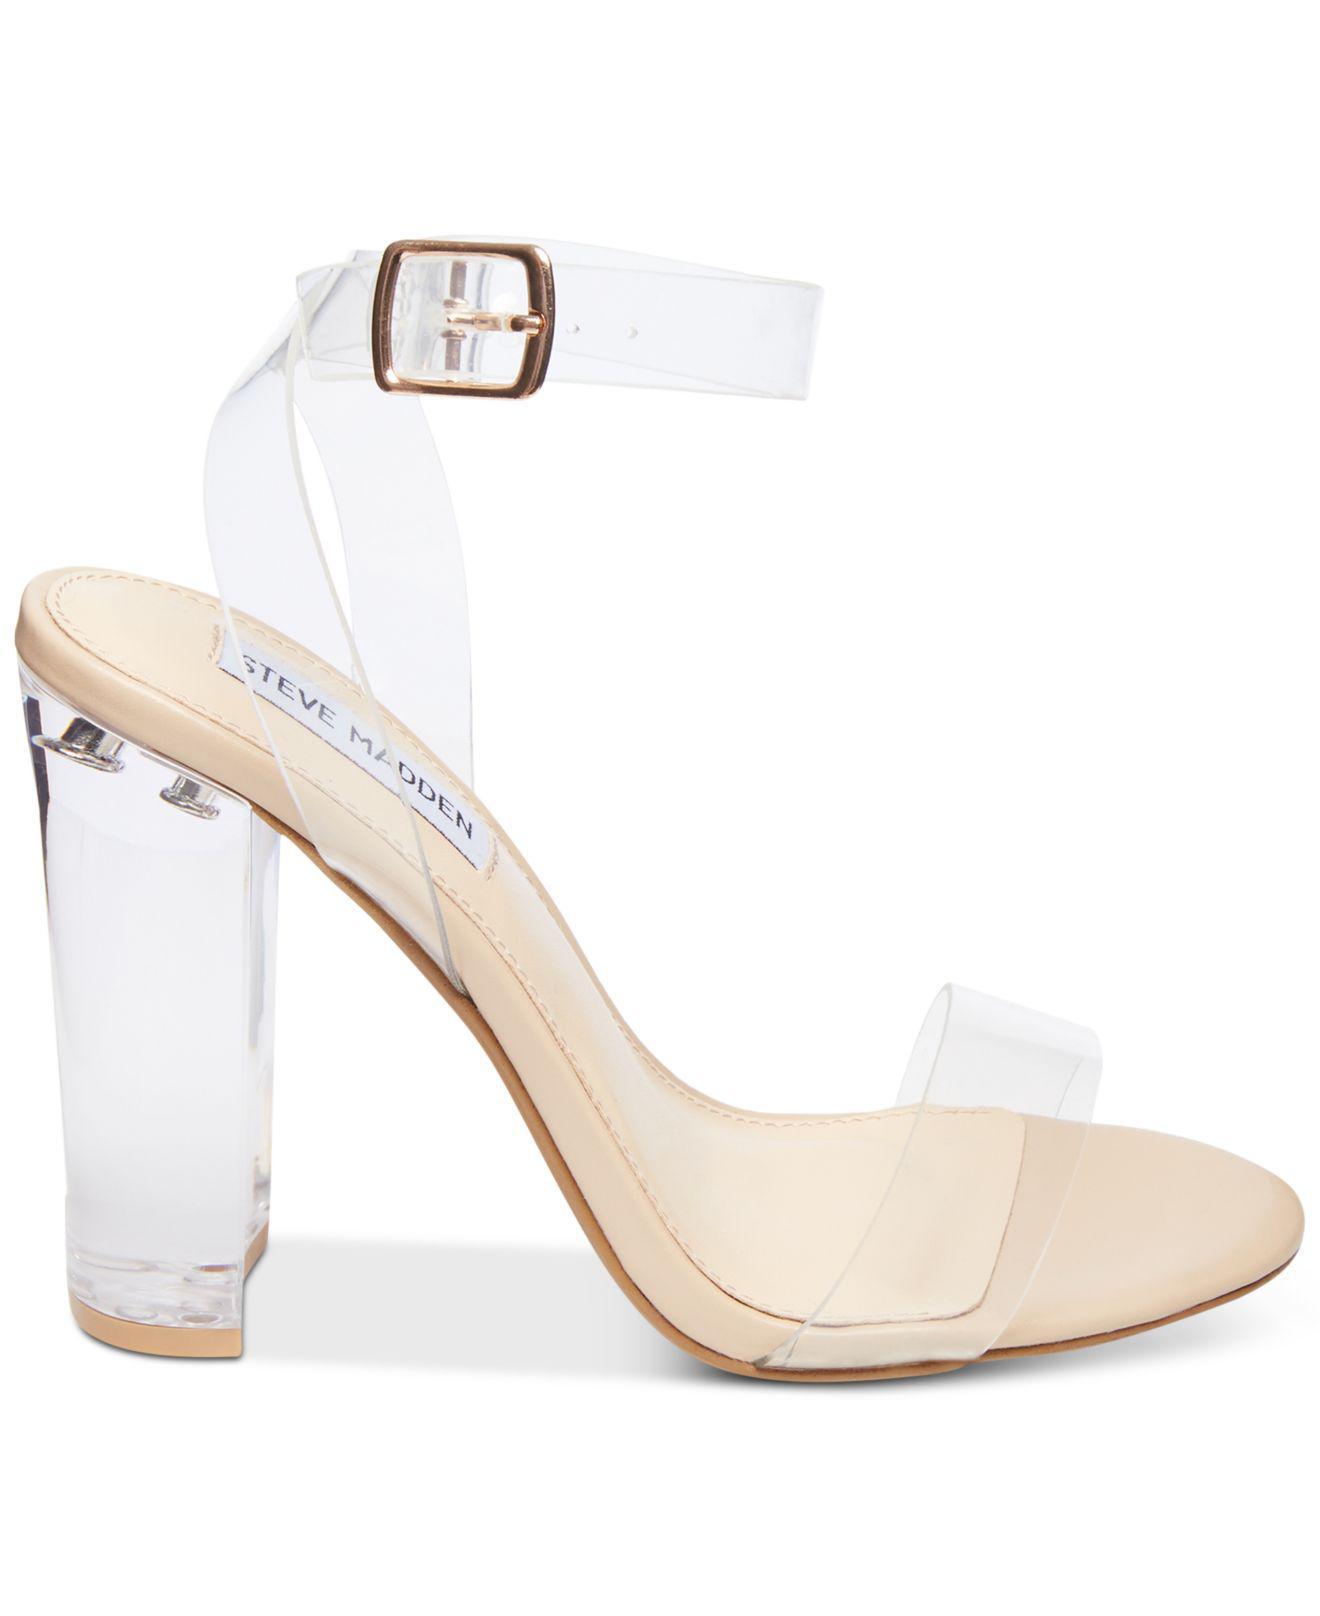 b86304788c22a Lyst - Steve Madden Camille Lucite Dress Sandals